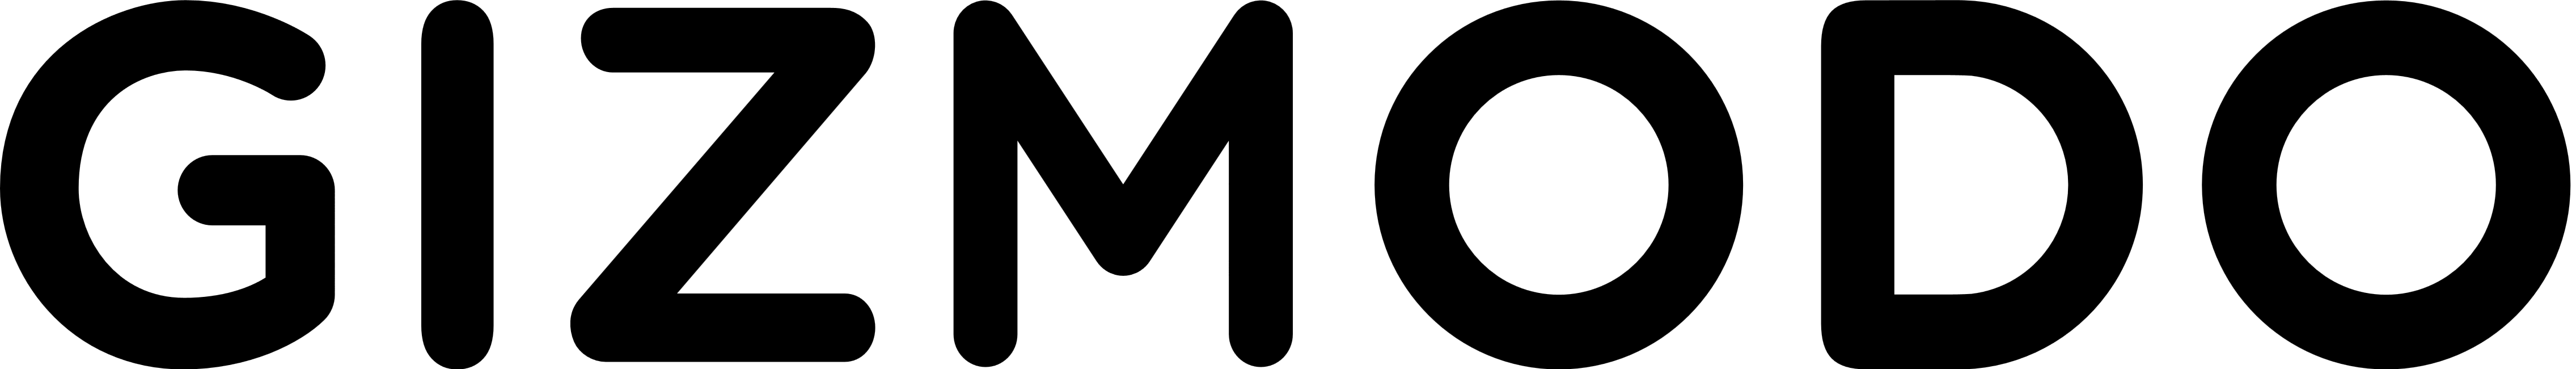 Gizmodo u2013 Logos Download